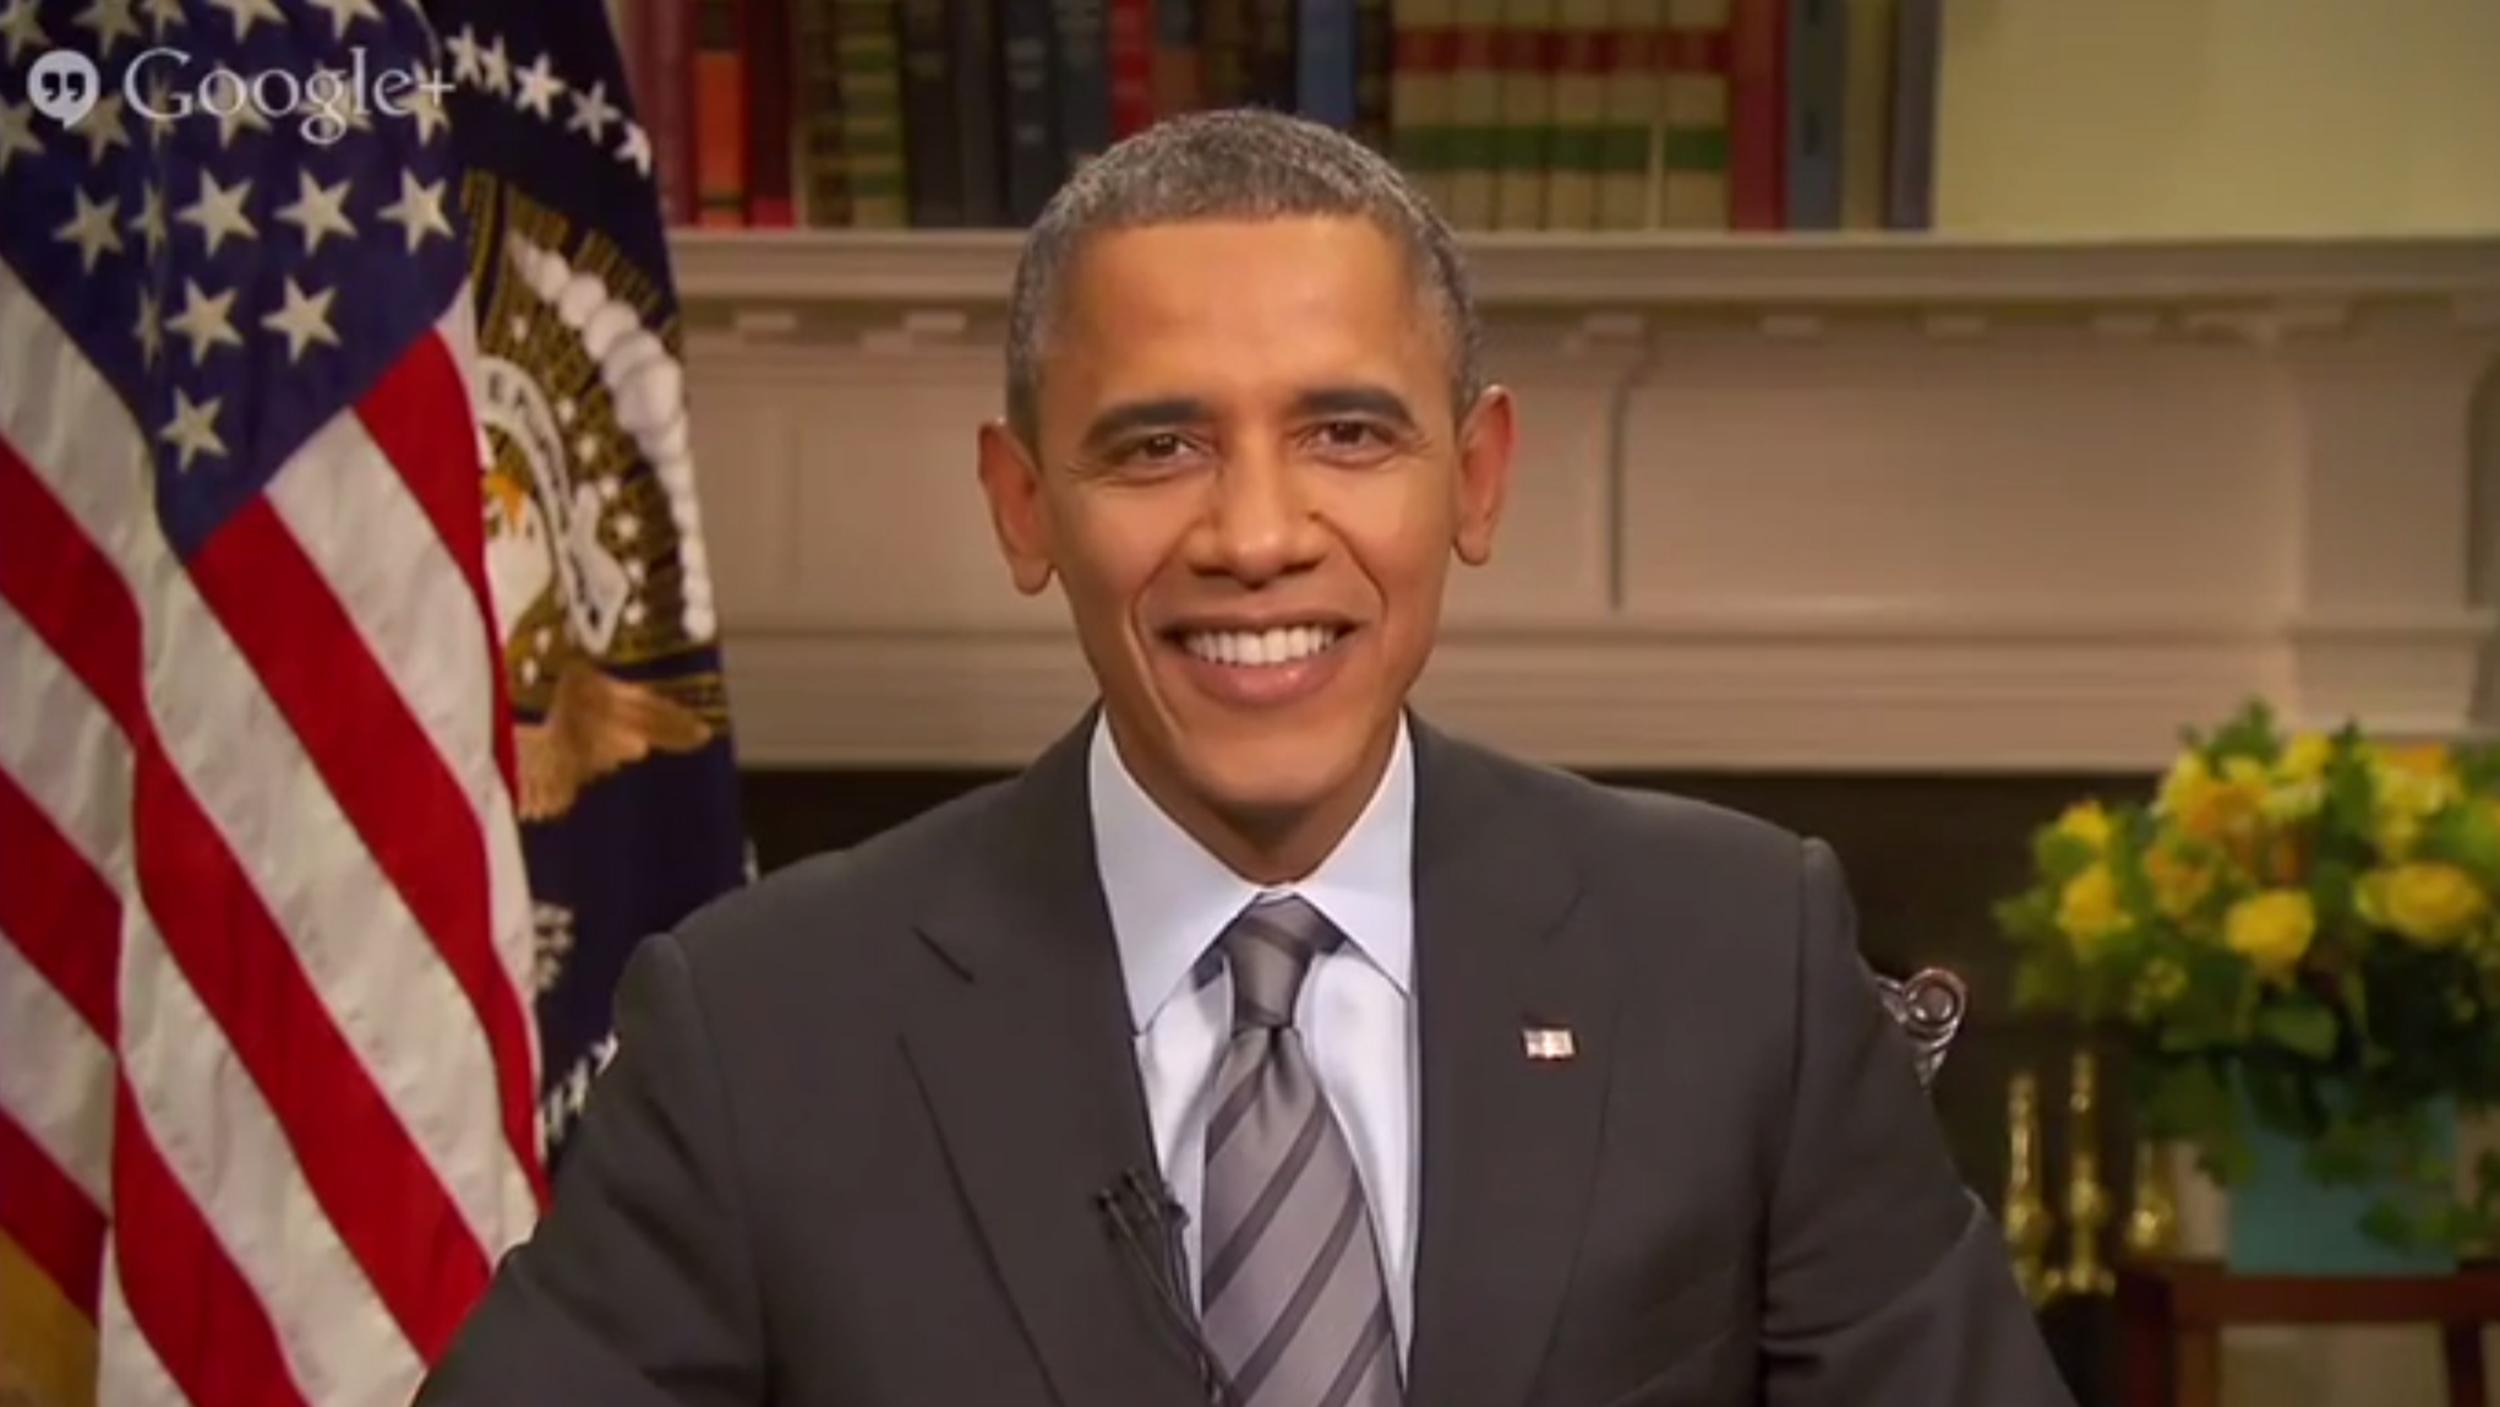 President Obama Michelle Still Thinks Im Pretty Cute